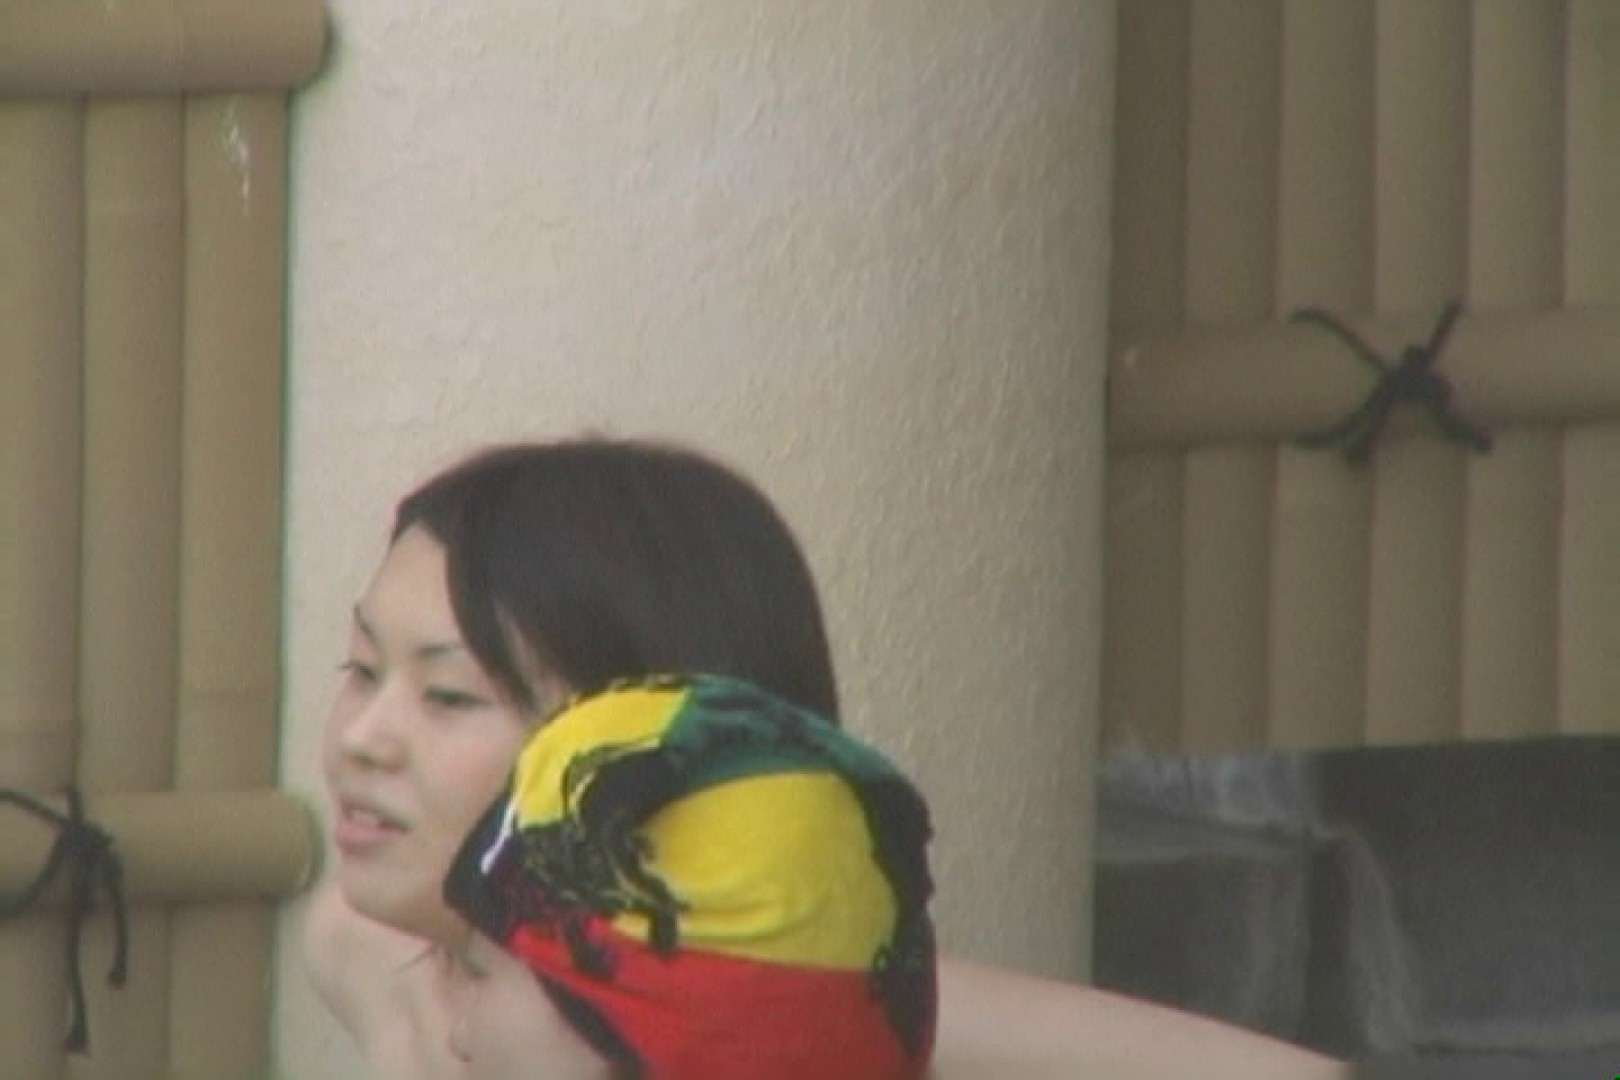 Aquaな露天風呂Vol.61【VIP限定】 いやらしいOL エロ無料画像 89連発 70